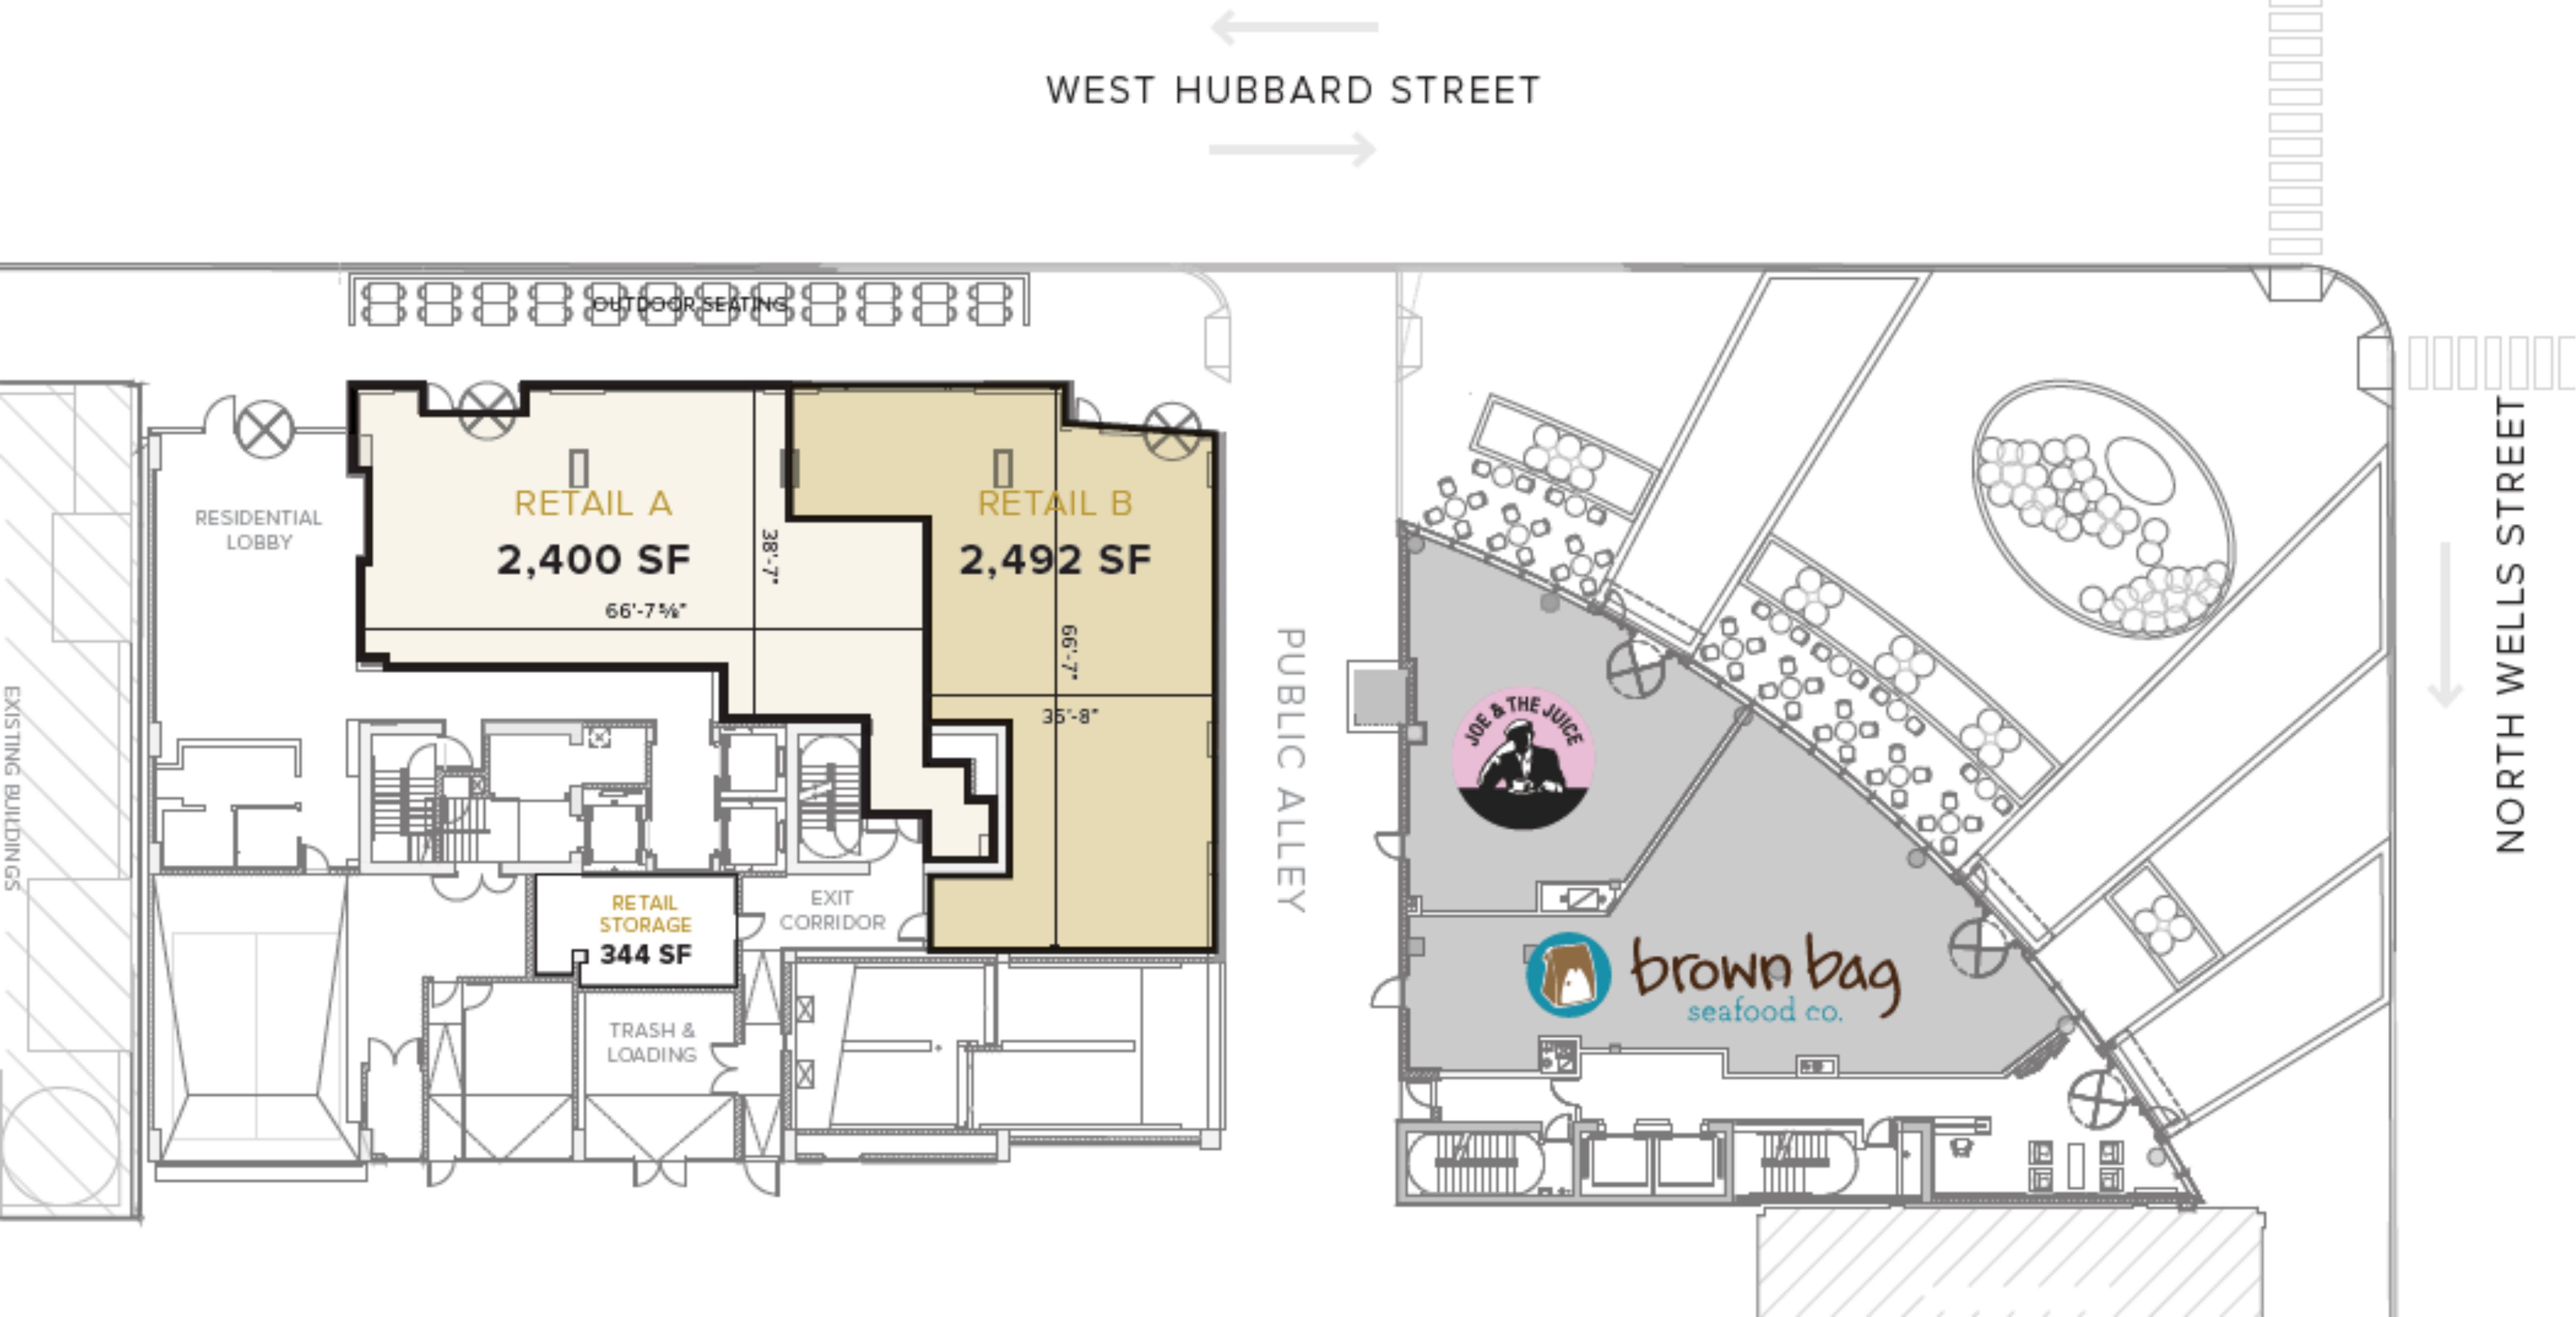 Hubbard 221: site plan